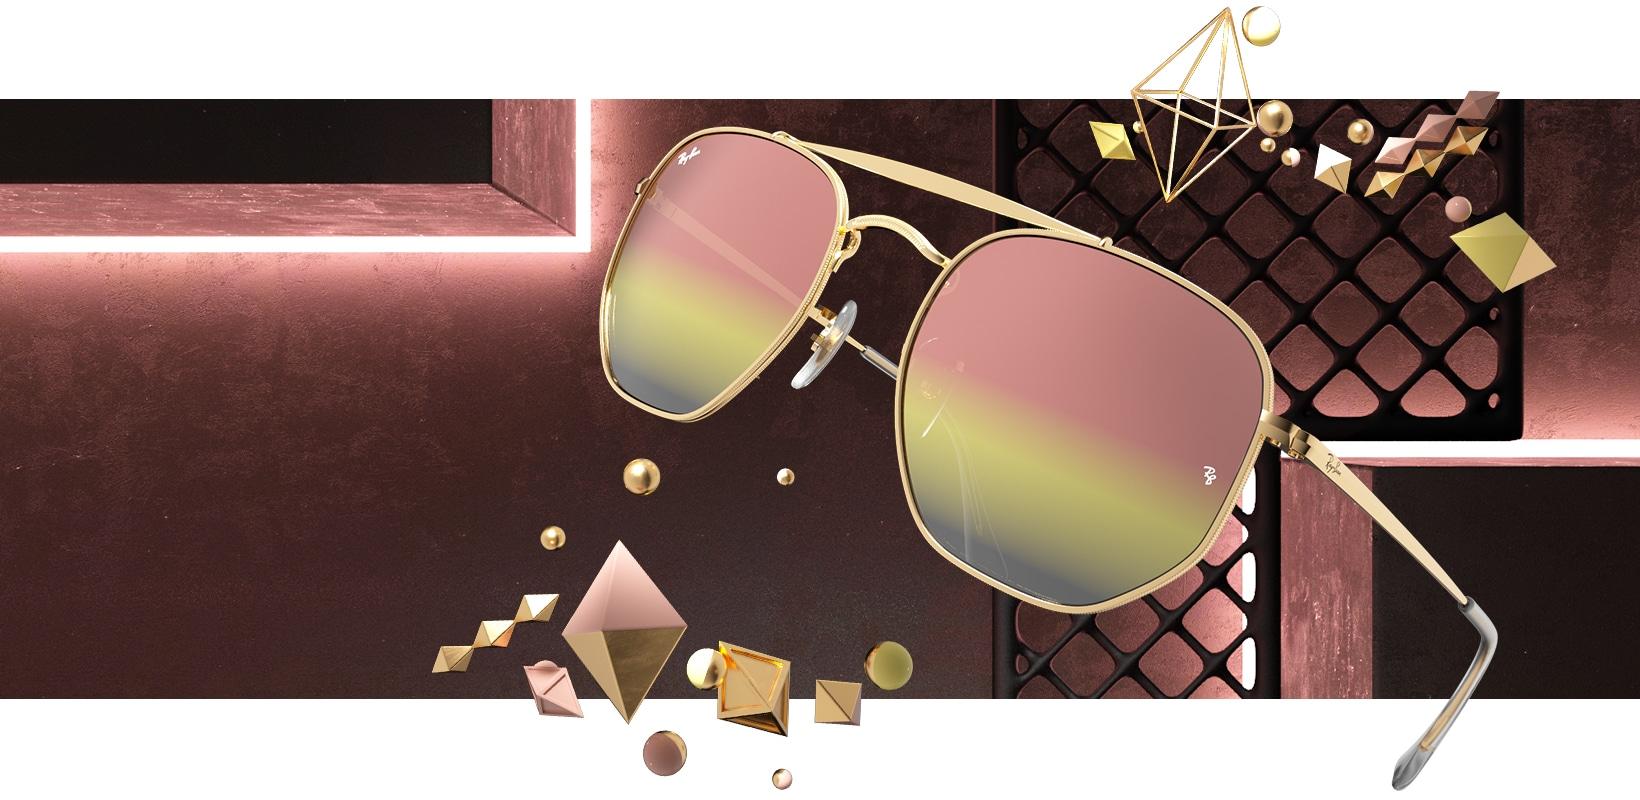 d4ead310e06 Custom and Personalized Sunglasses   Eyeglasses